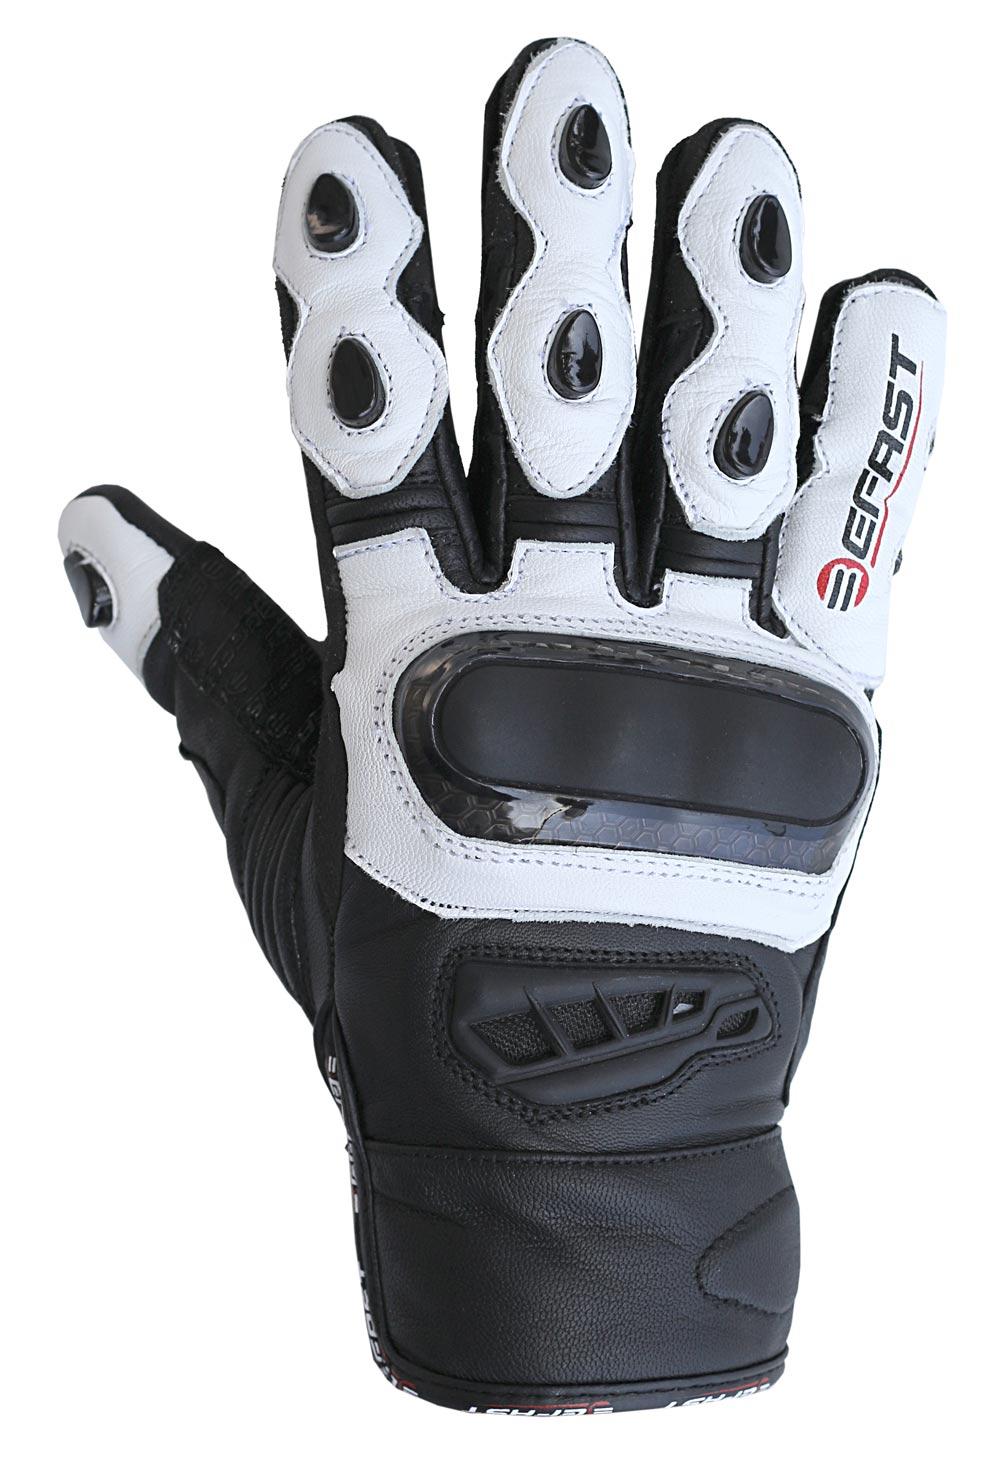 Guanti moto pelle racing Befast Pro Short Nero Bianco